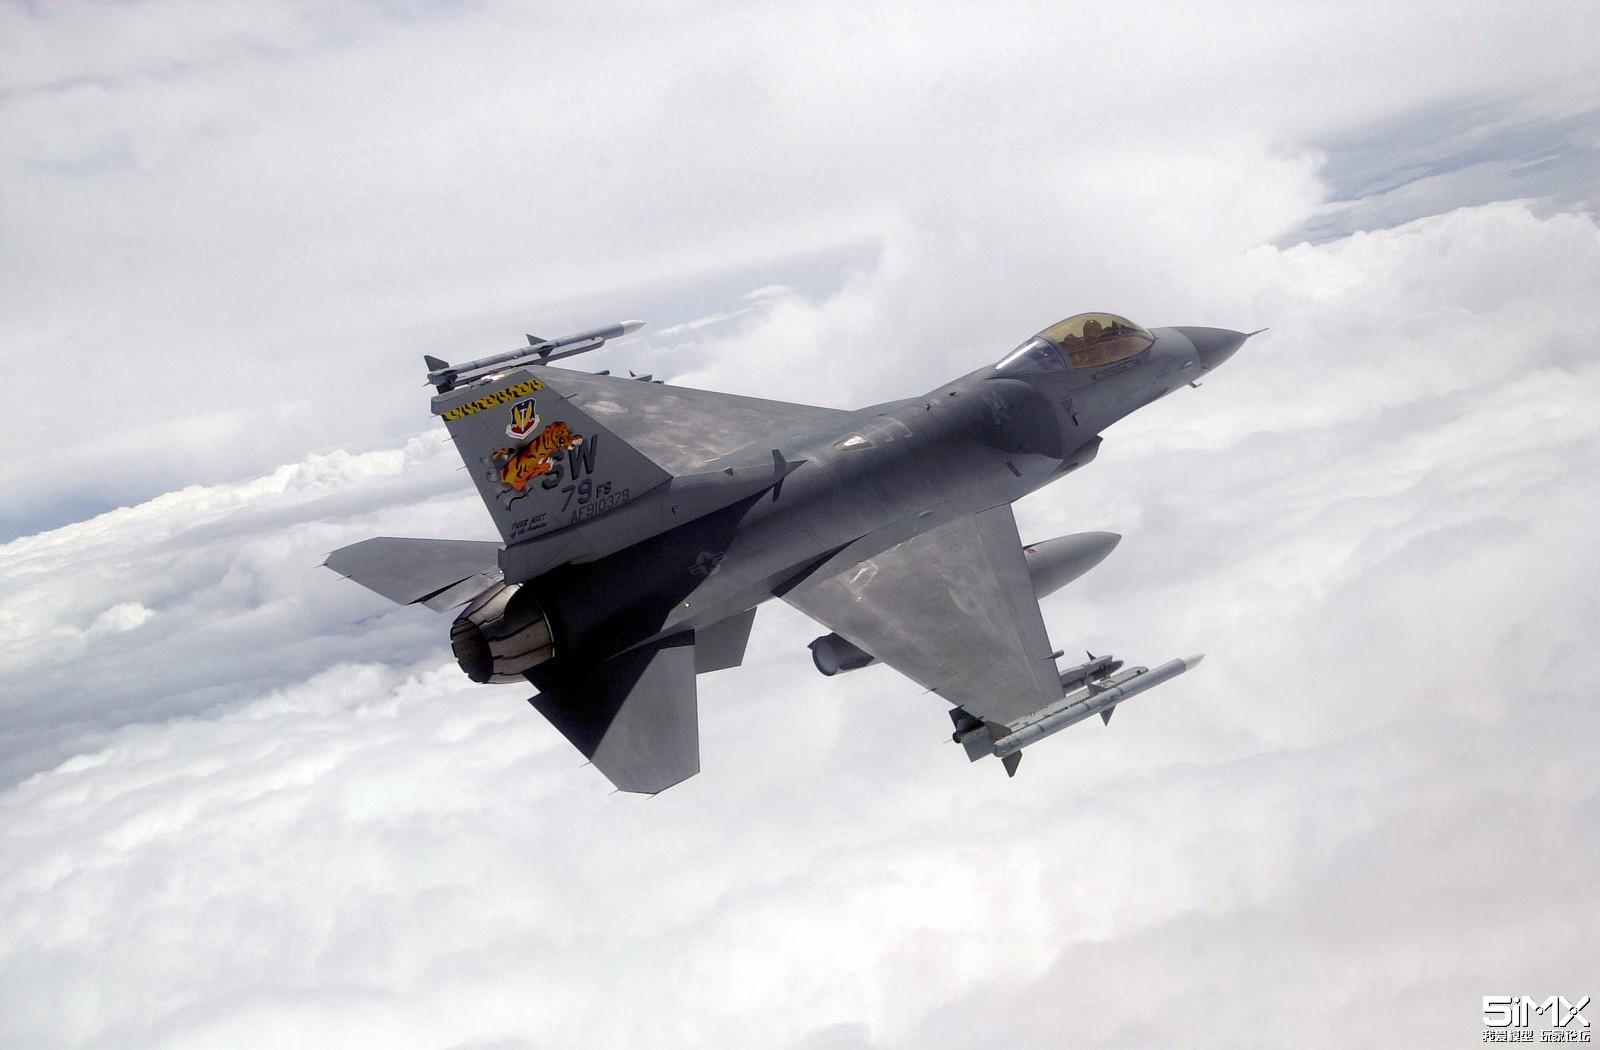 lieutenant-colonel-james-horton-79th-fighter-squadron-commander-banks-an-f-942ada-1600.jpg